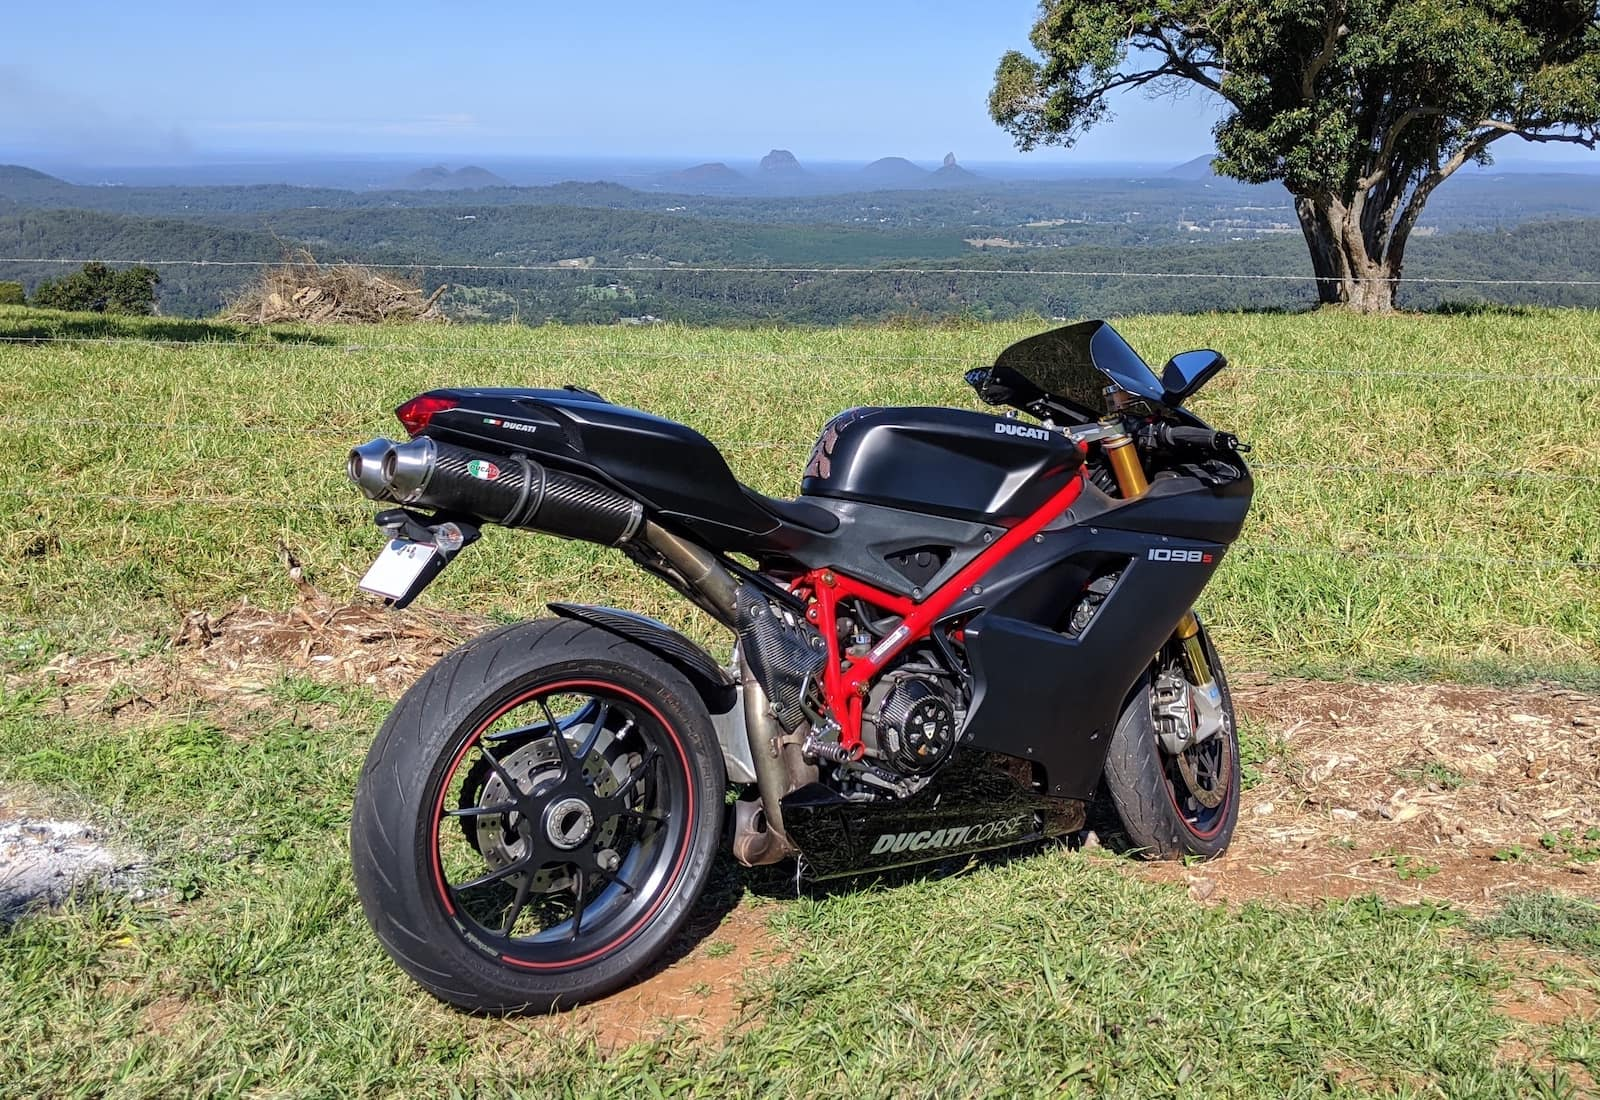 My black Ducati 1098S